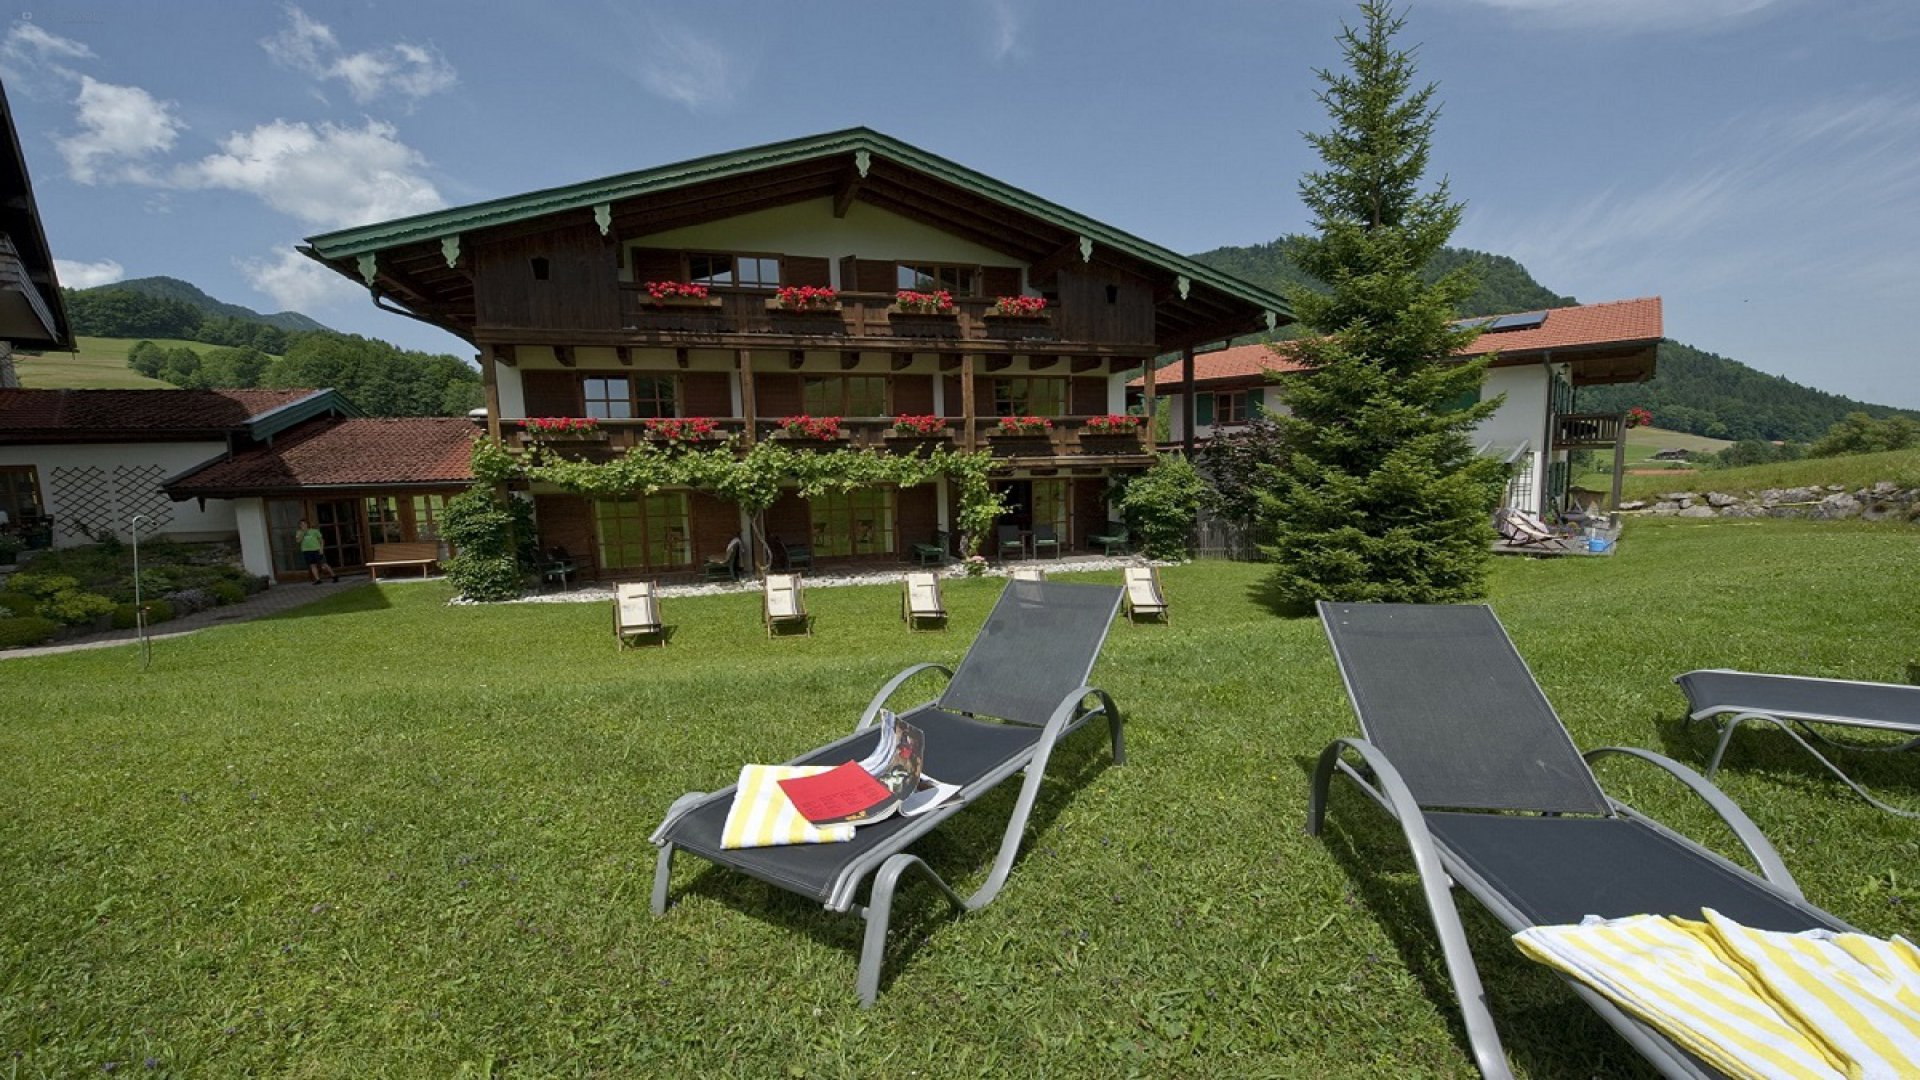 Landhotel Maiergschwendt by DEVA 2